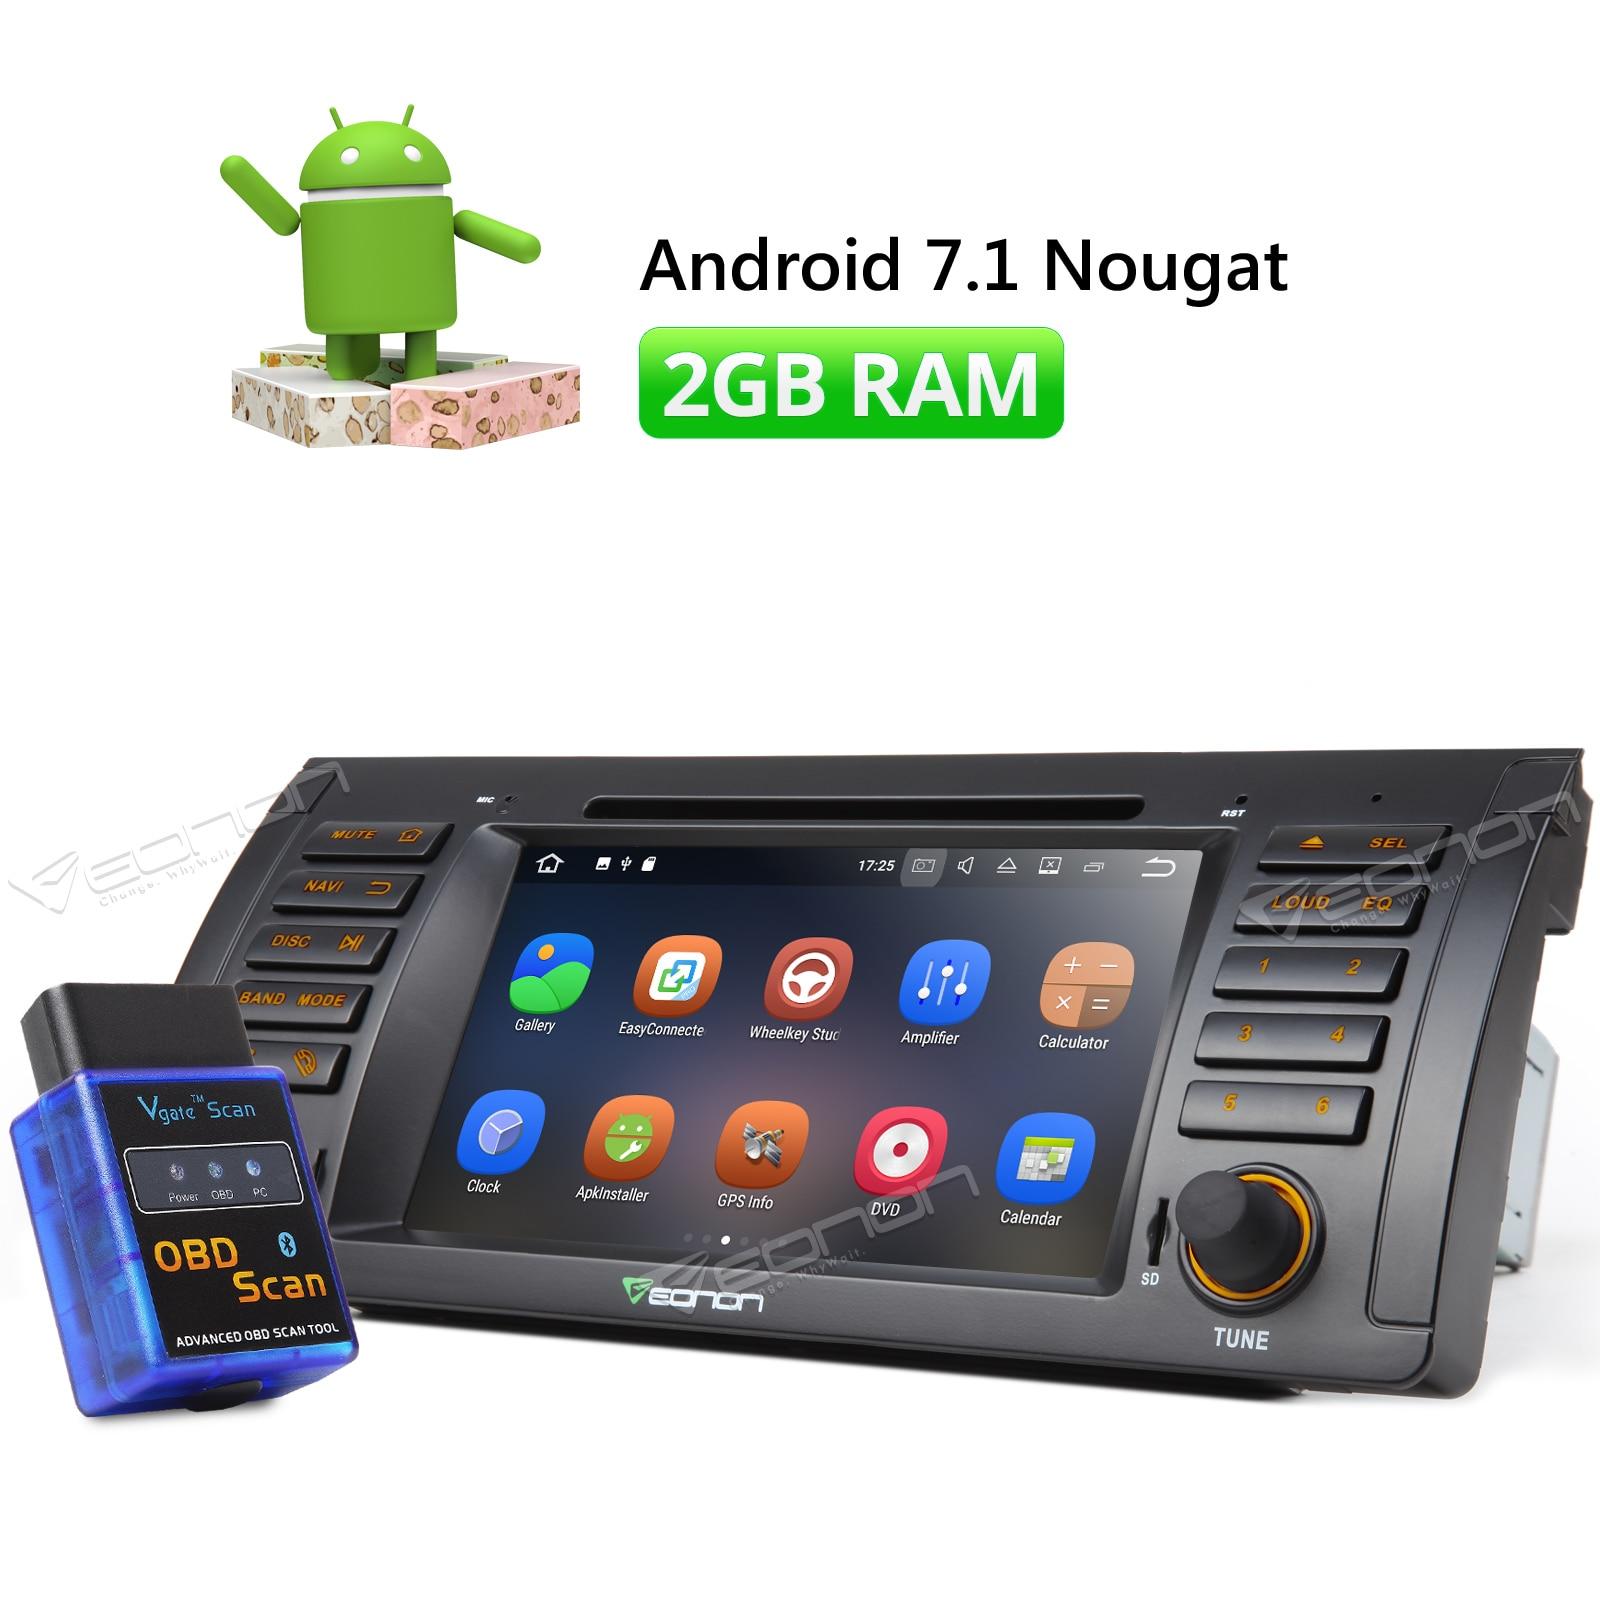 DVR 7 Android 7 1 Car Dash Stereo for BMW E39 M5 Navigator Nougat Bluetooth 2GB